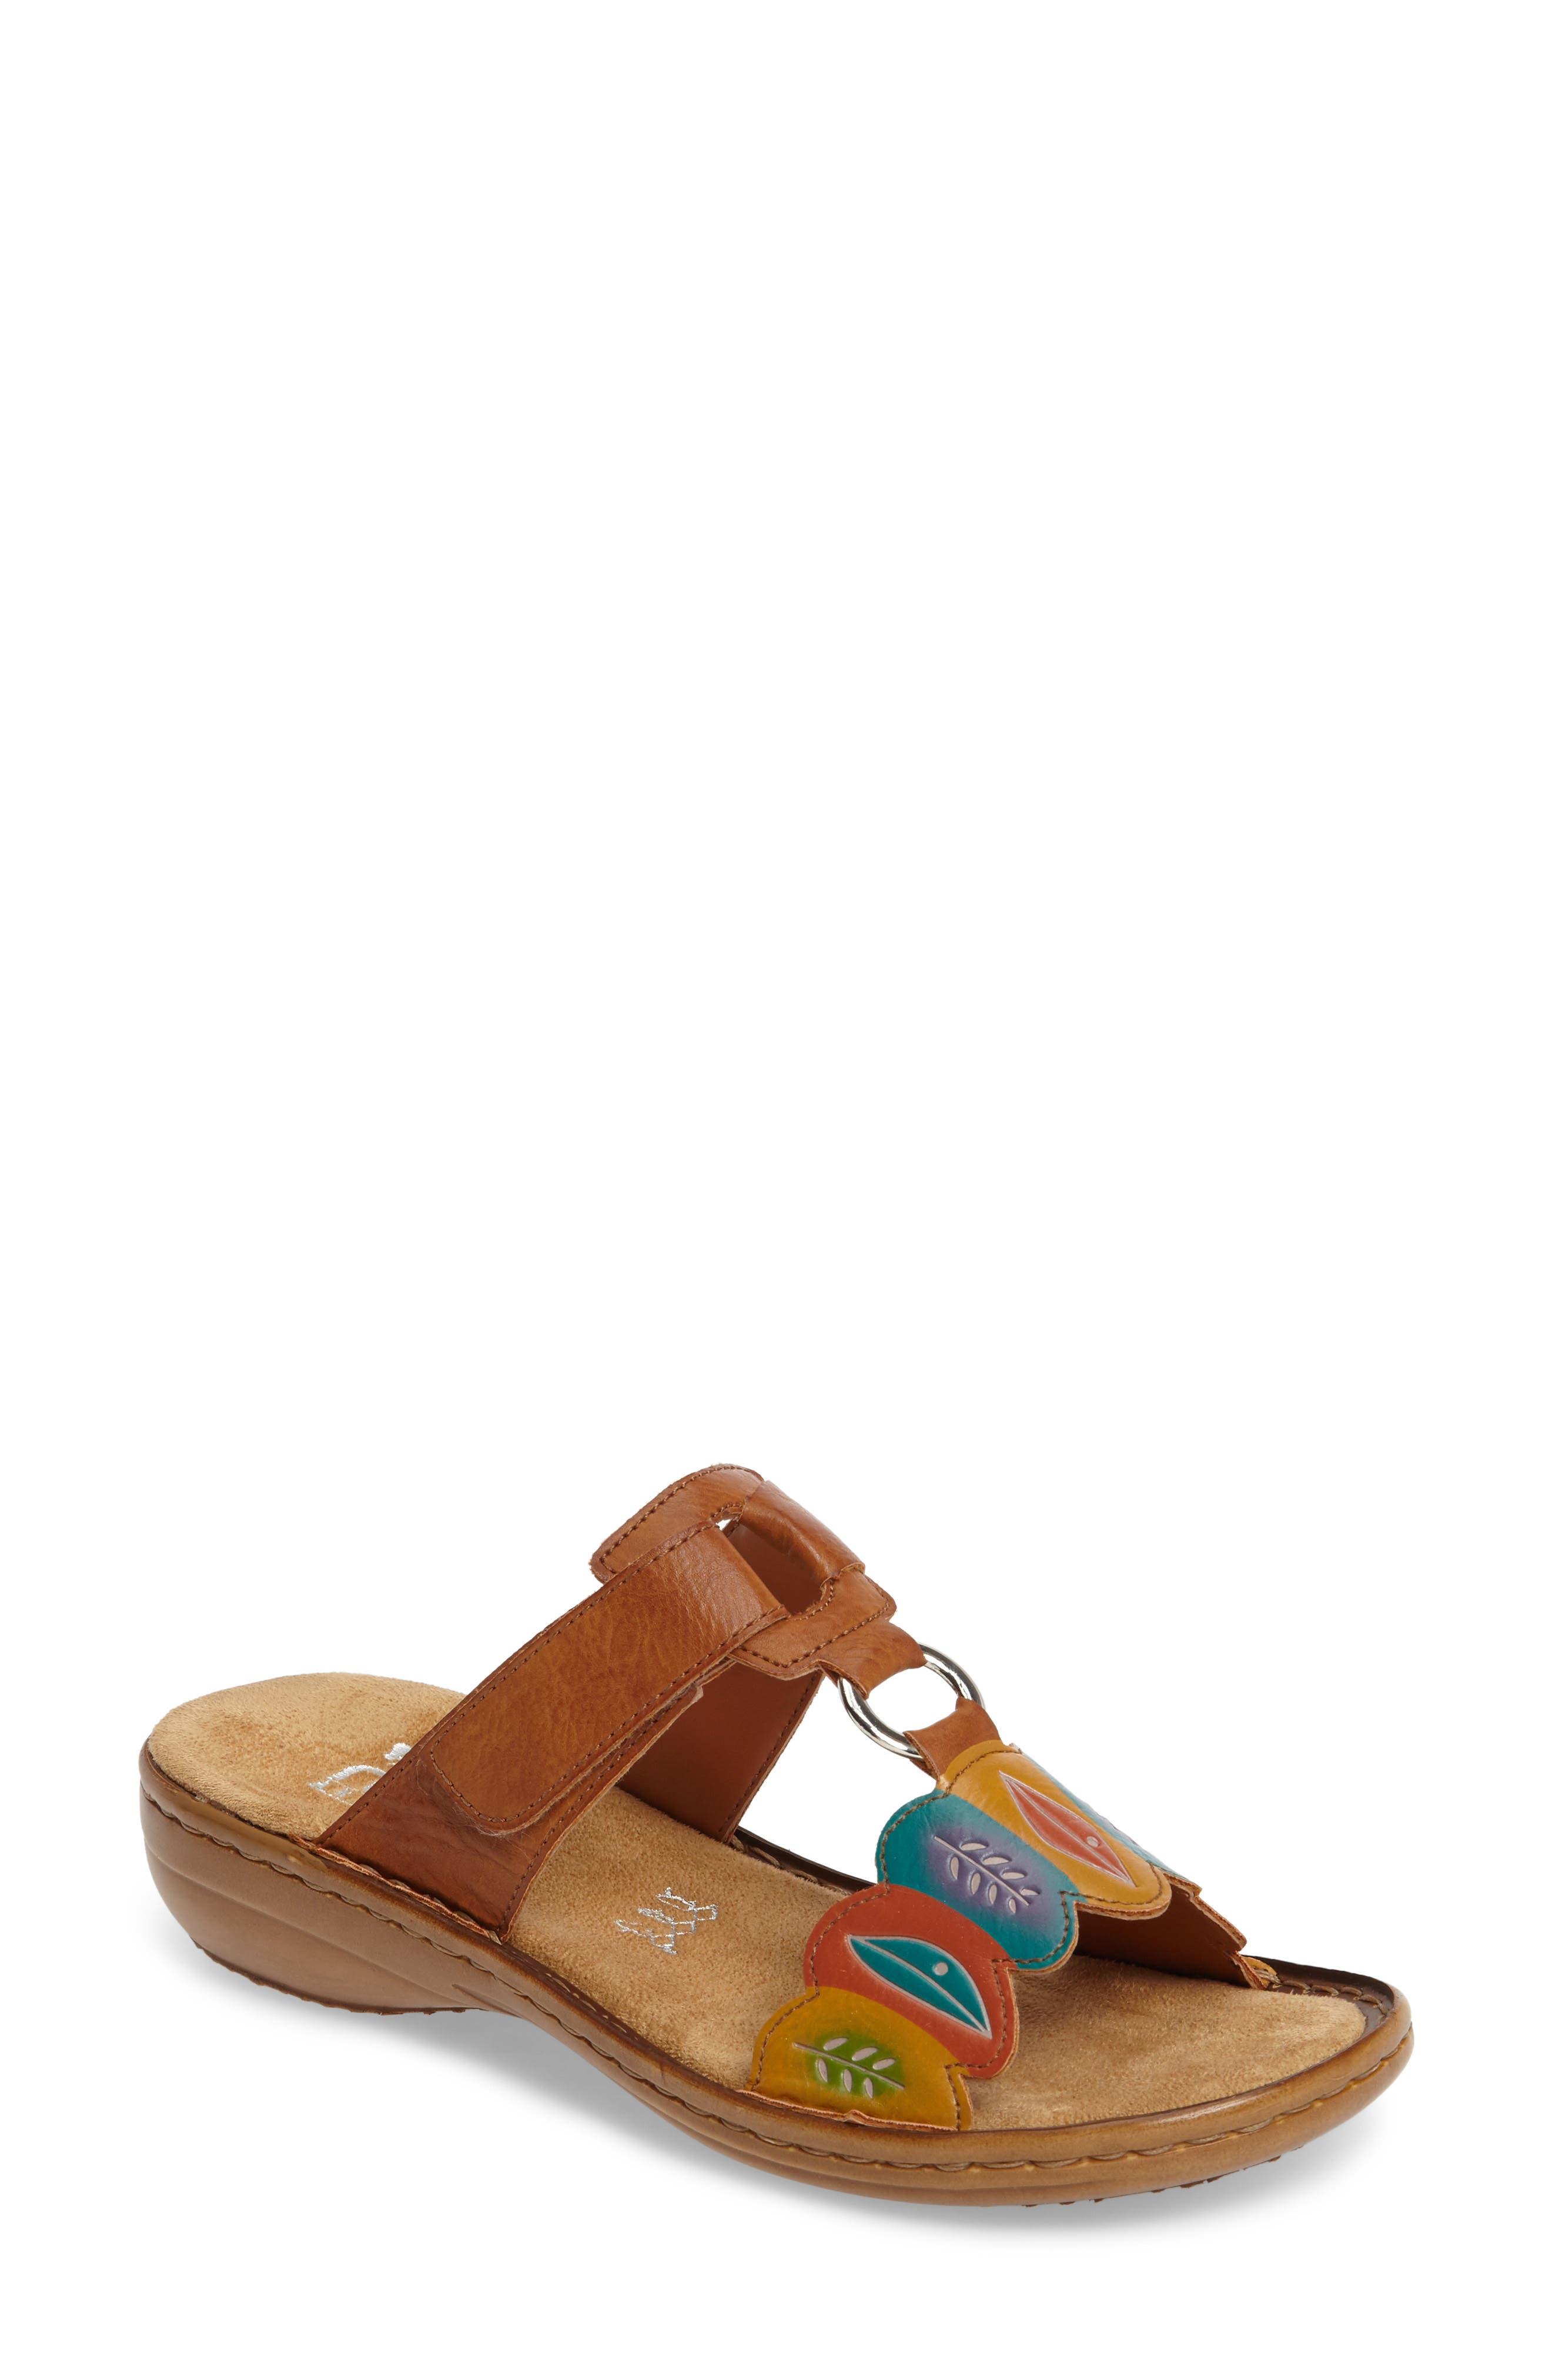 Regina R4 Slide Sandal,                             Main thumbnail 1, color,                             219